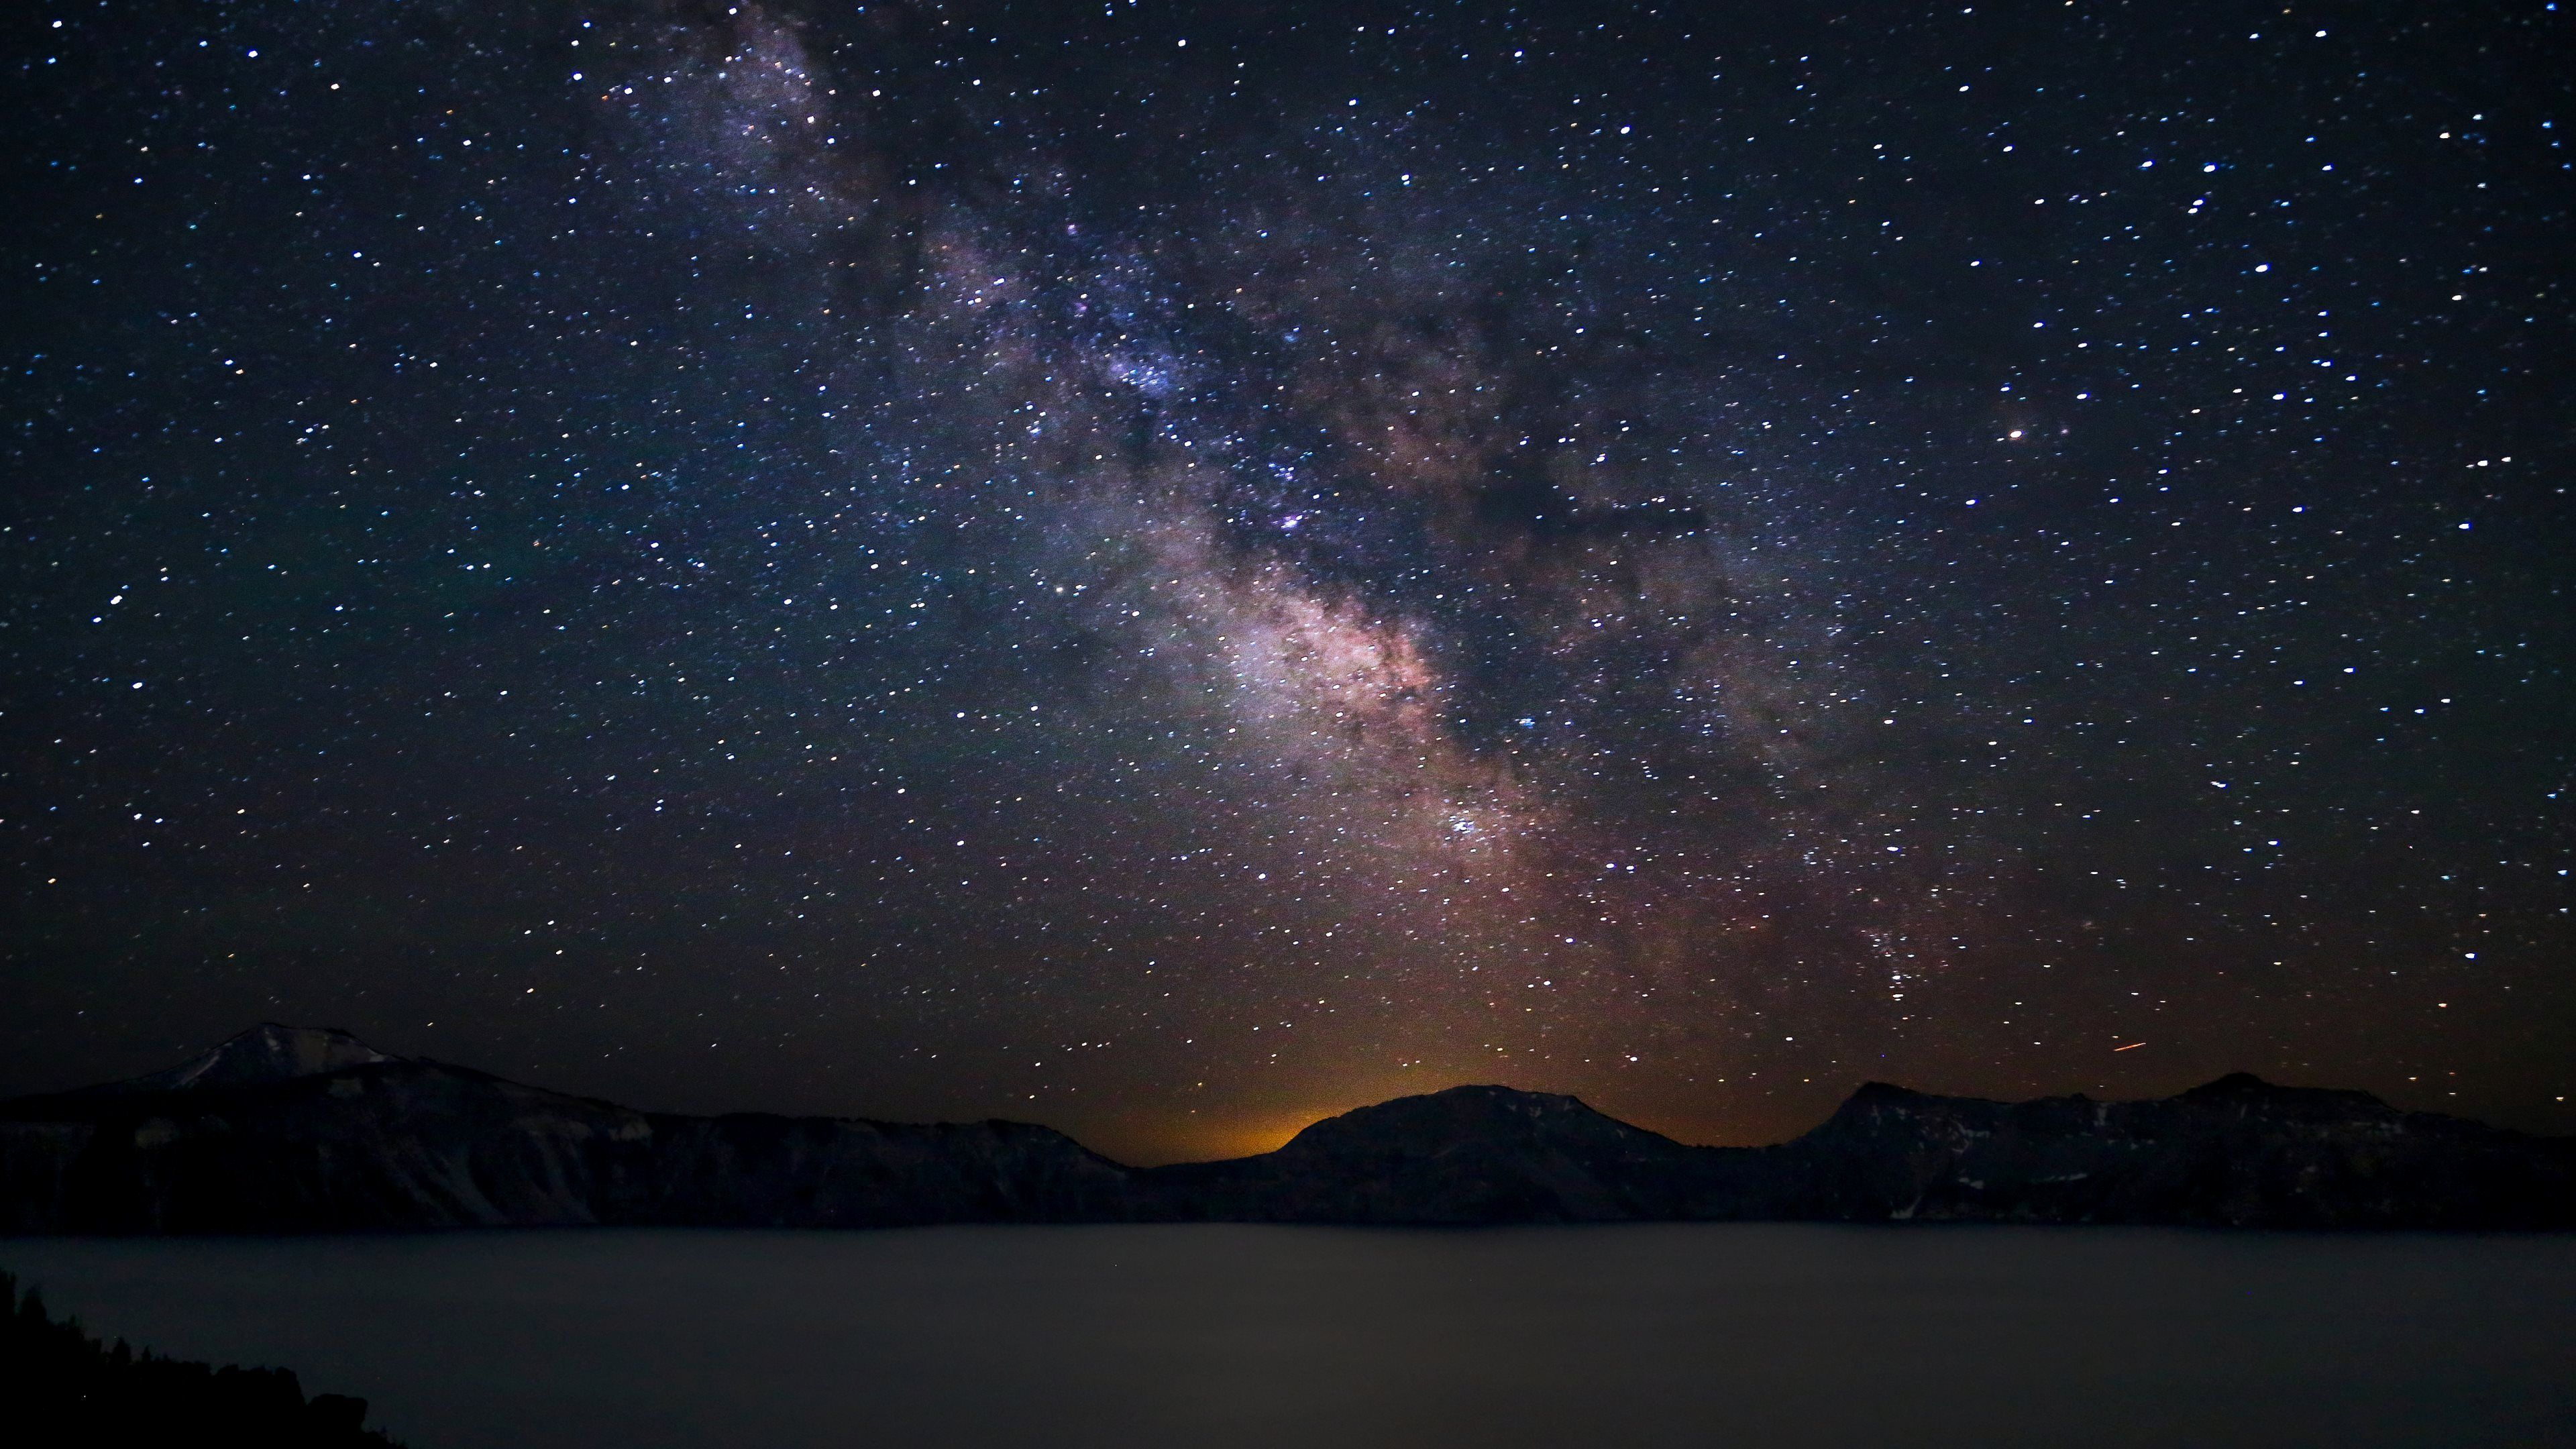 Starry Night Sky wallpaper.